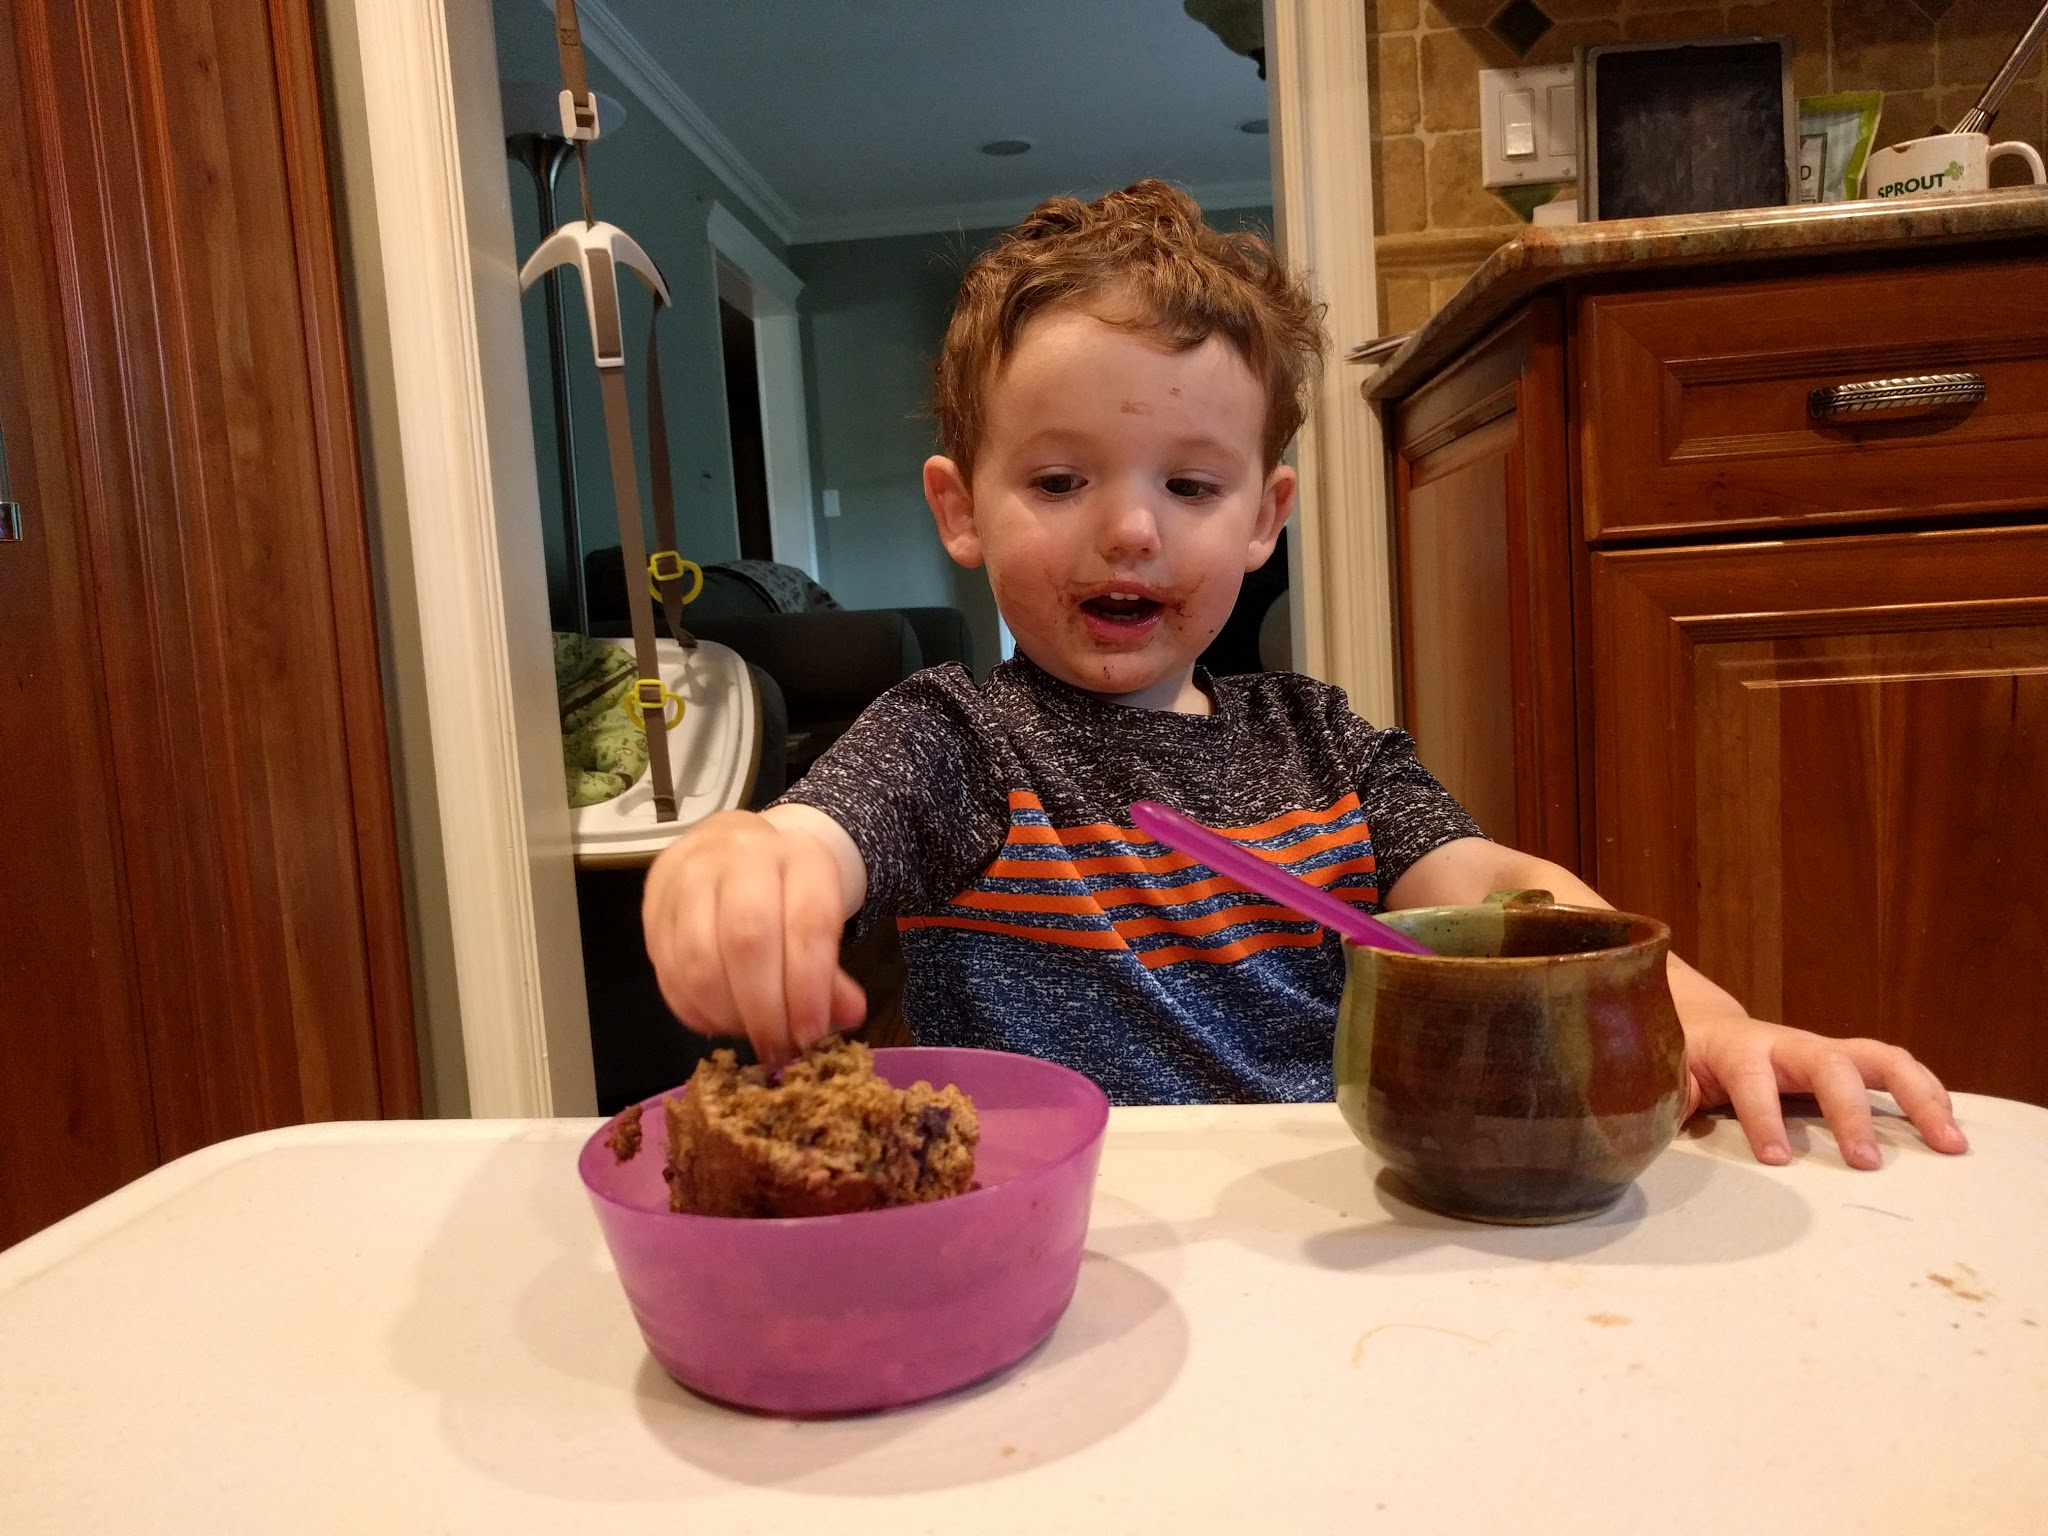 Chef Zachary, Age 2